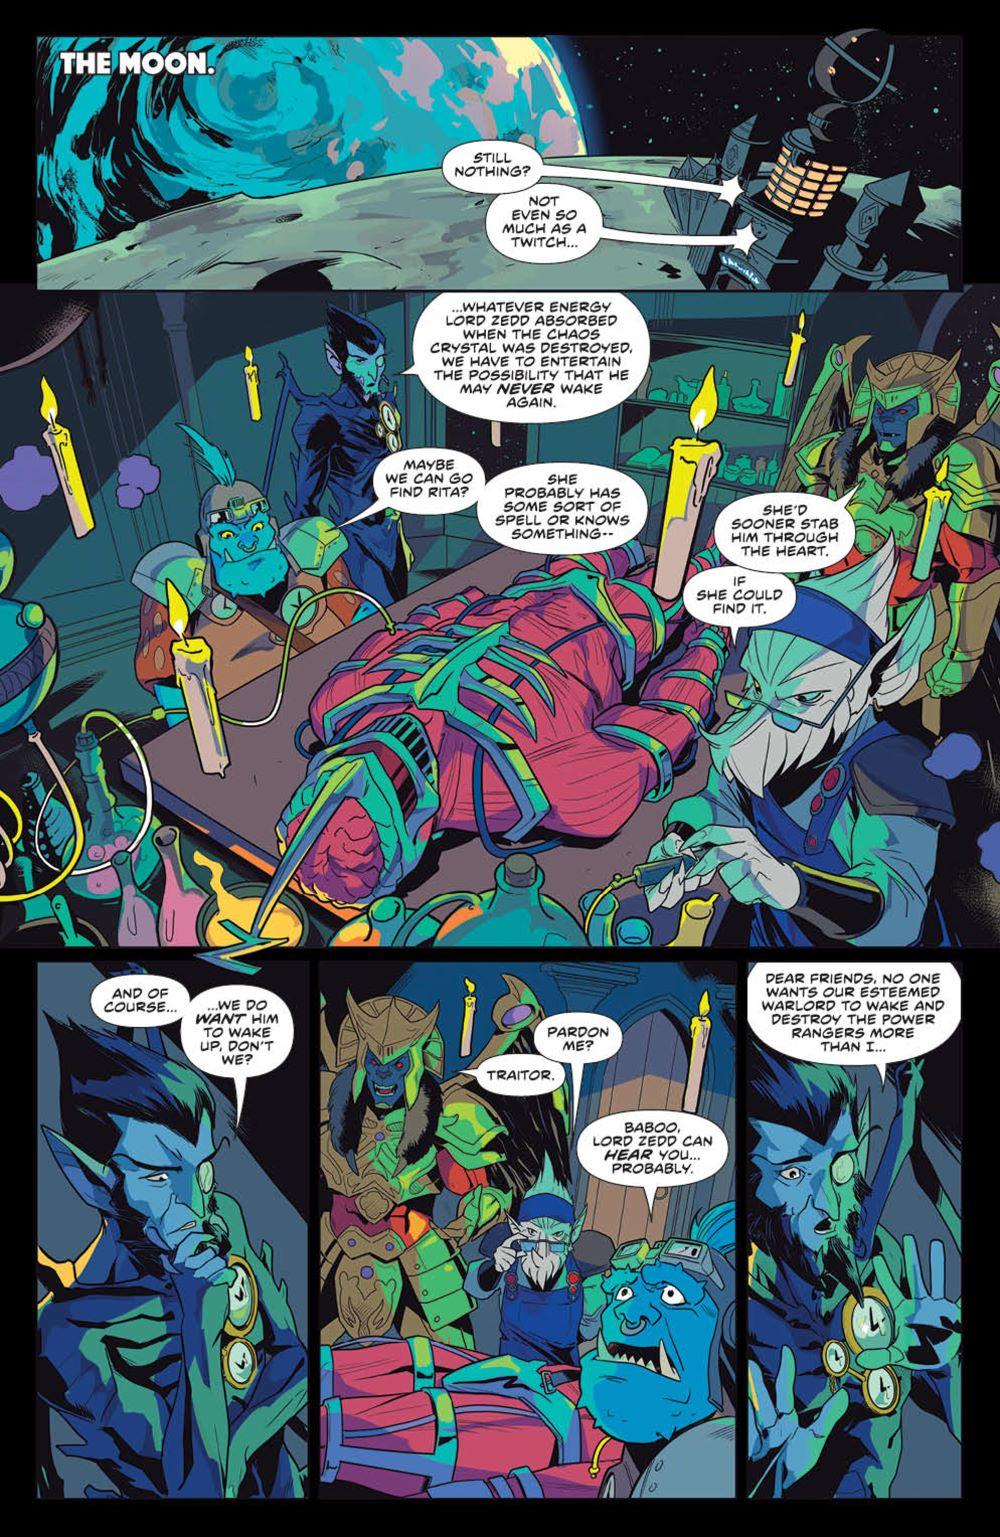 MightyMorphin_v1_SC_PRESS_15 ComicList Previews: MIGHTY MORPHIN VOLUME 1 TP